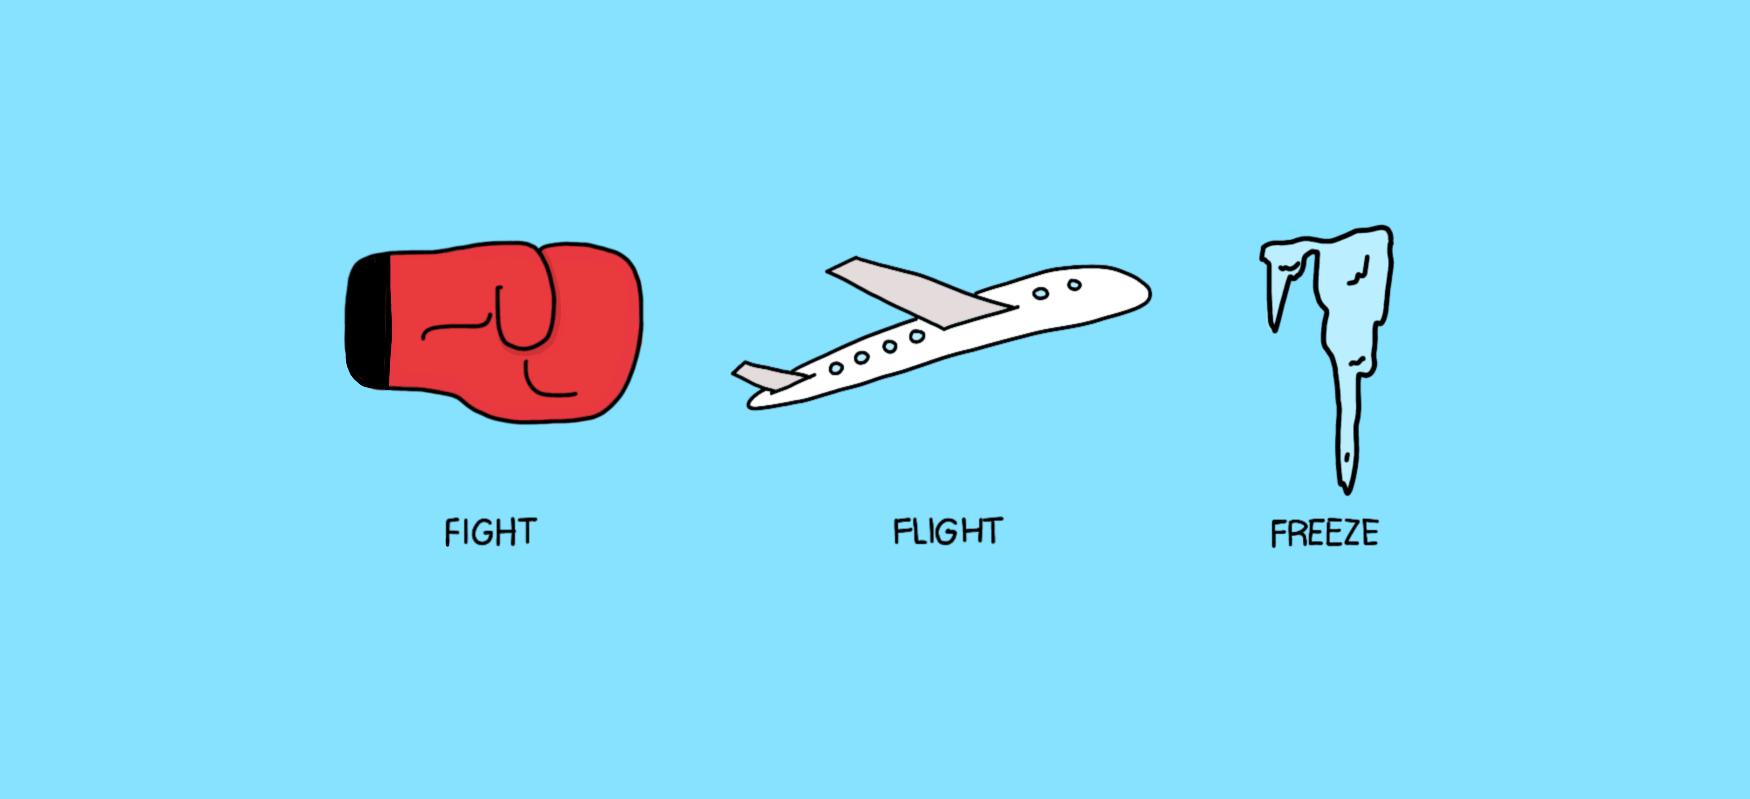 fight-flight-freeze-6